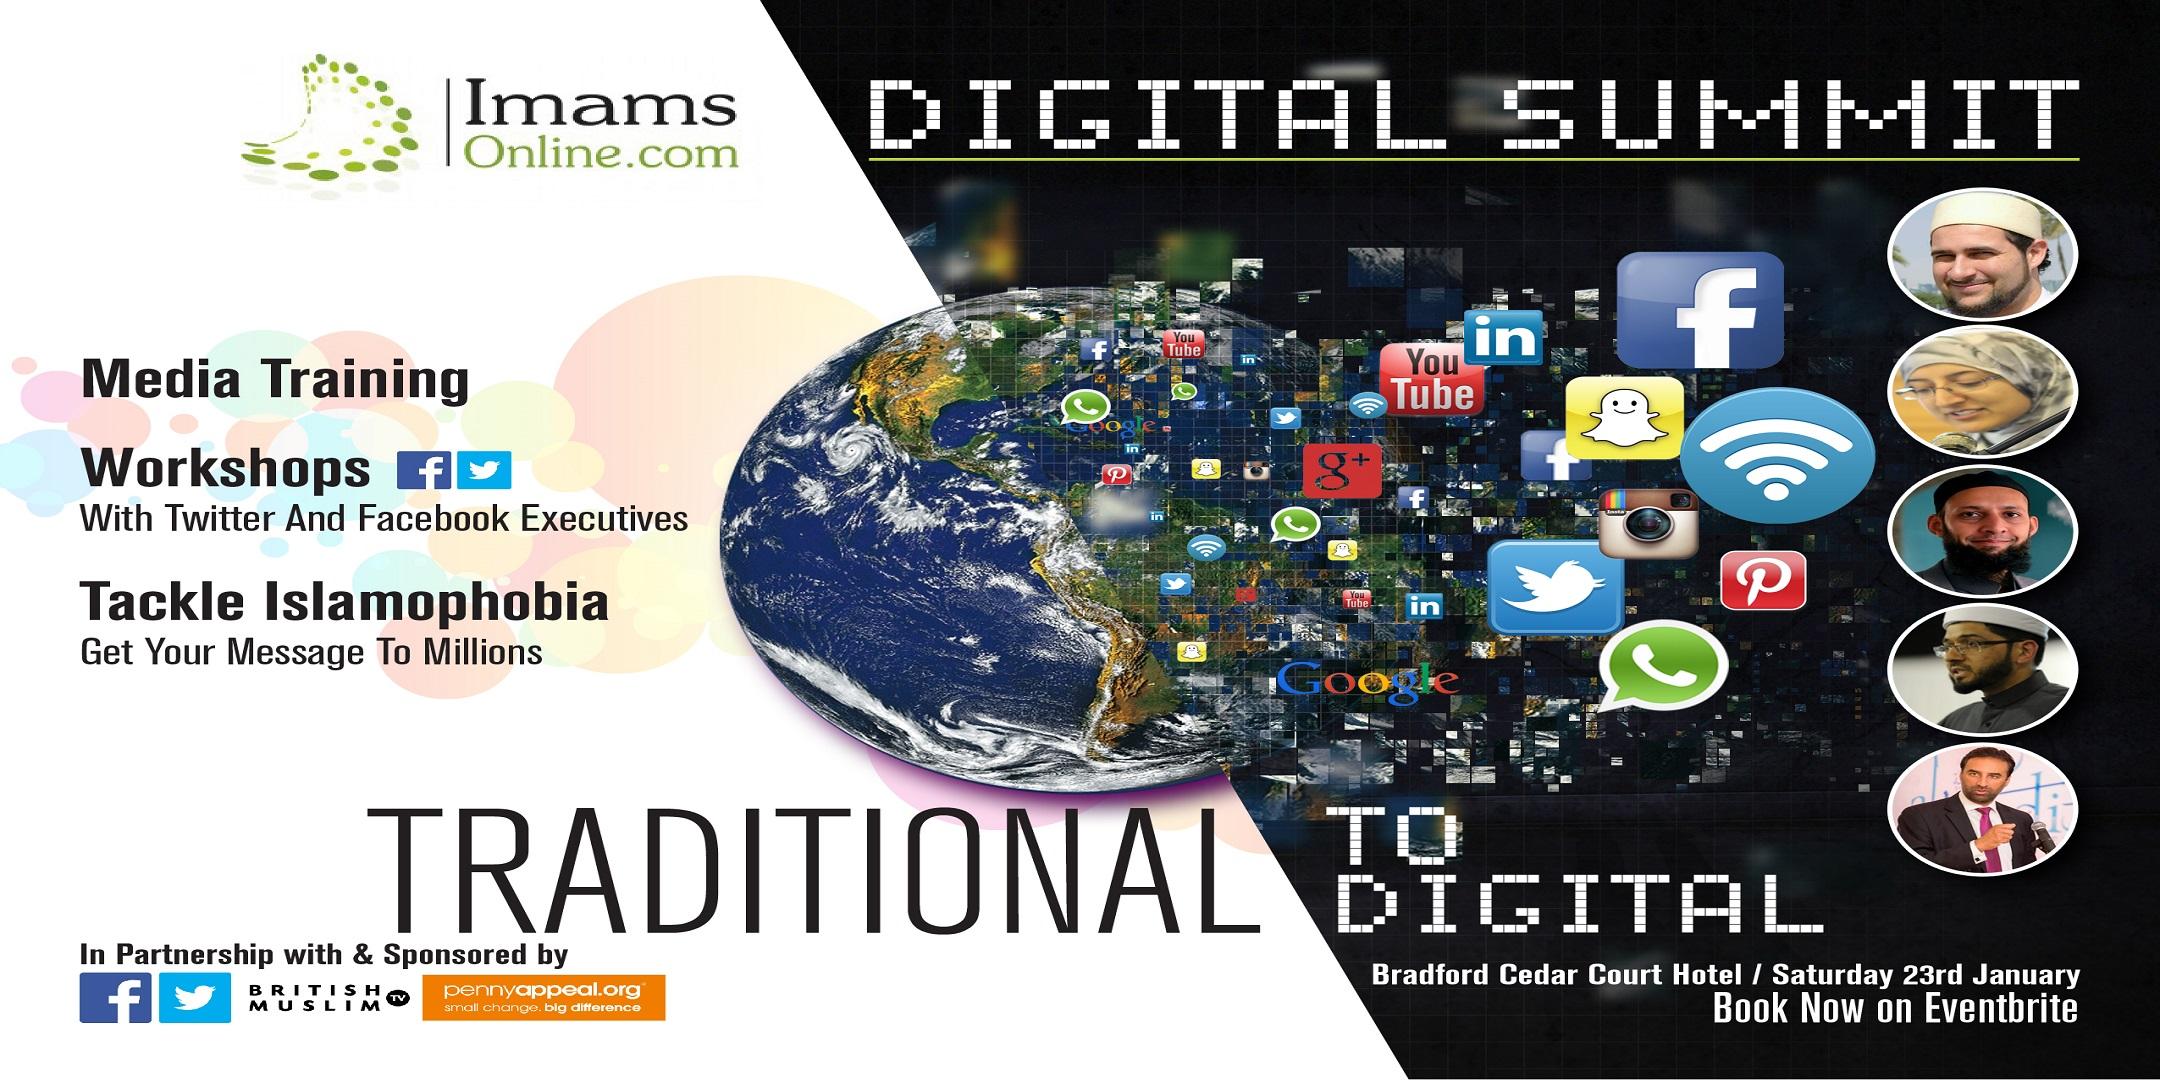 Imams Online Regional Digital Summit - Bradford